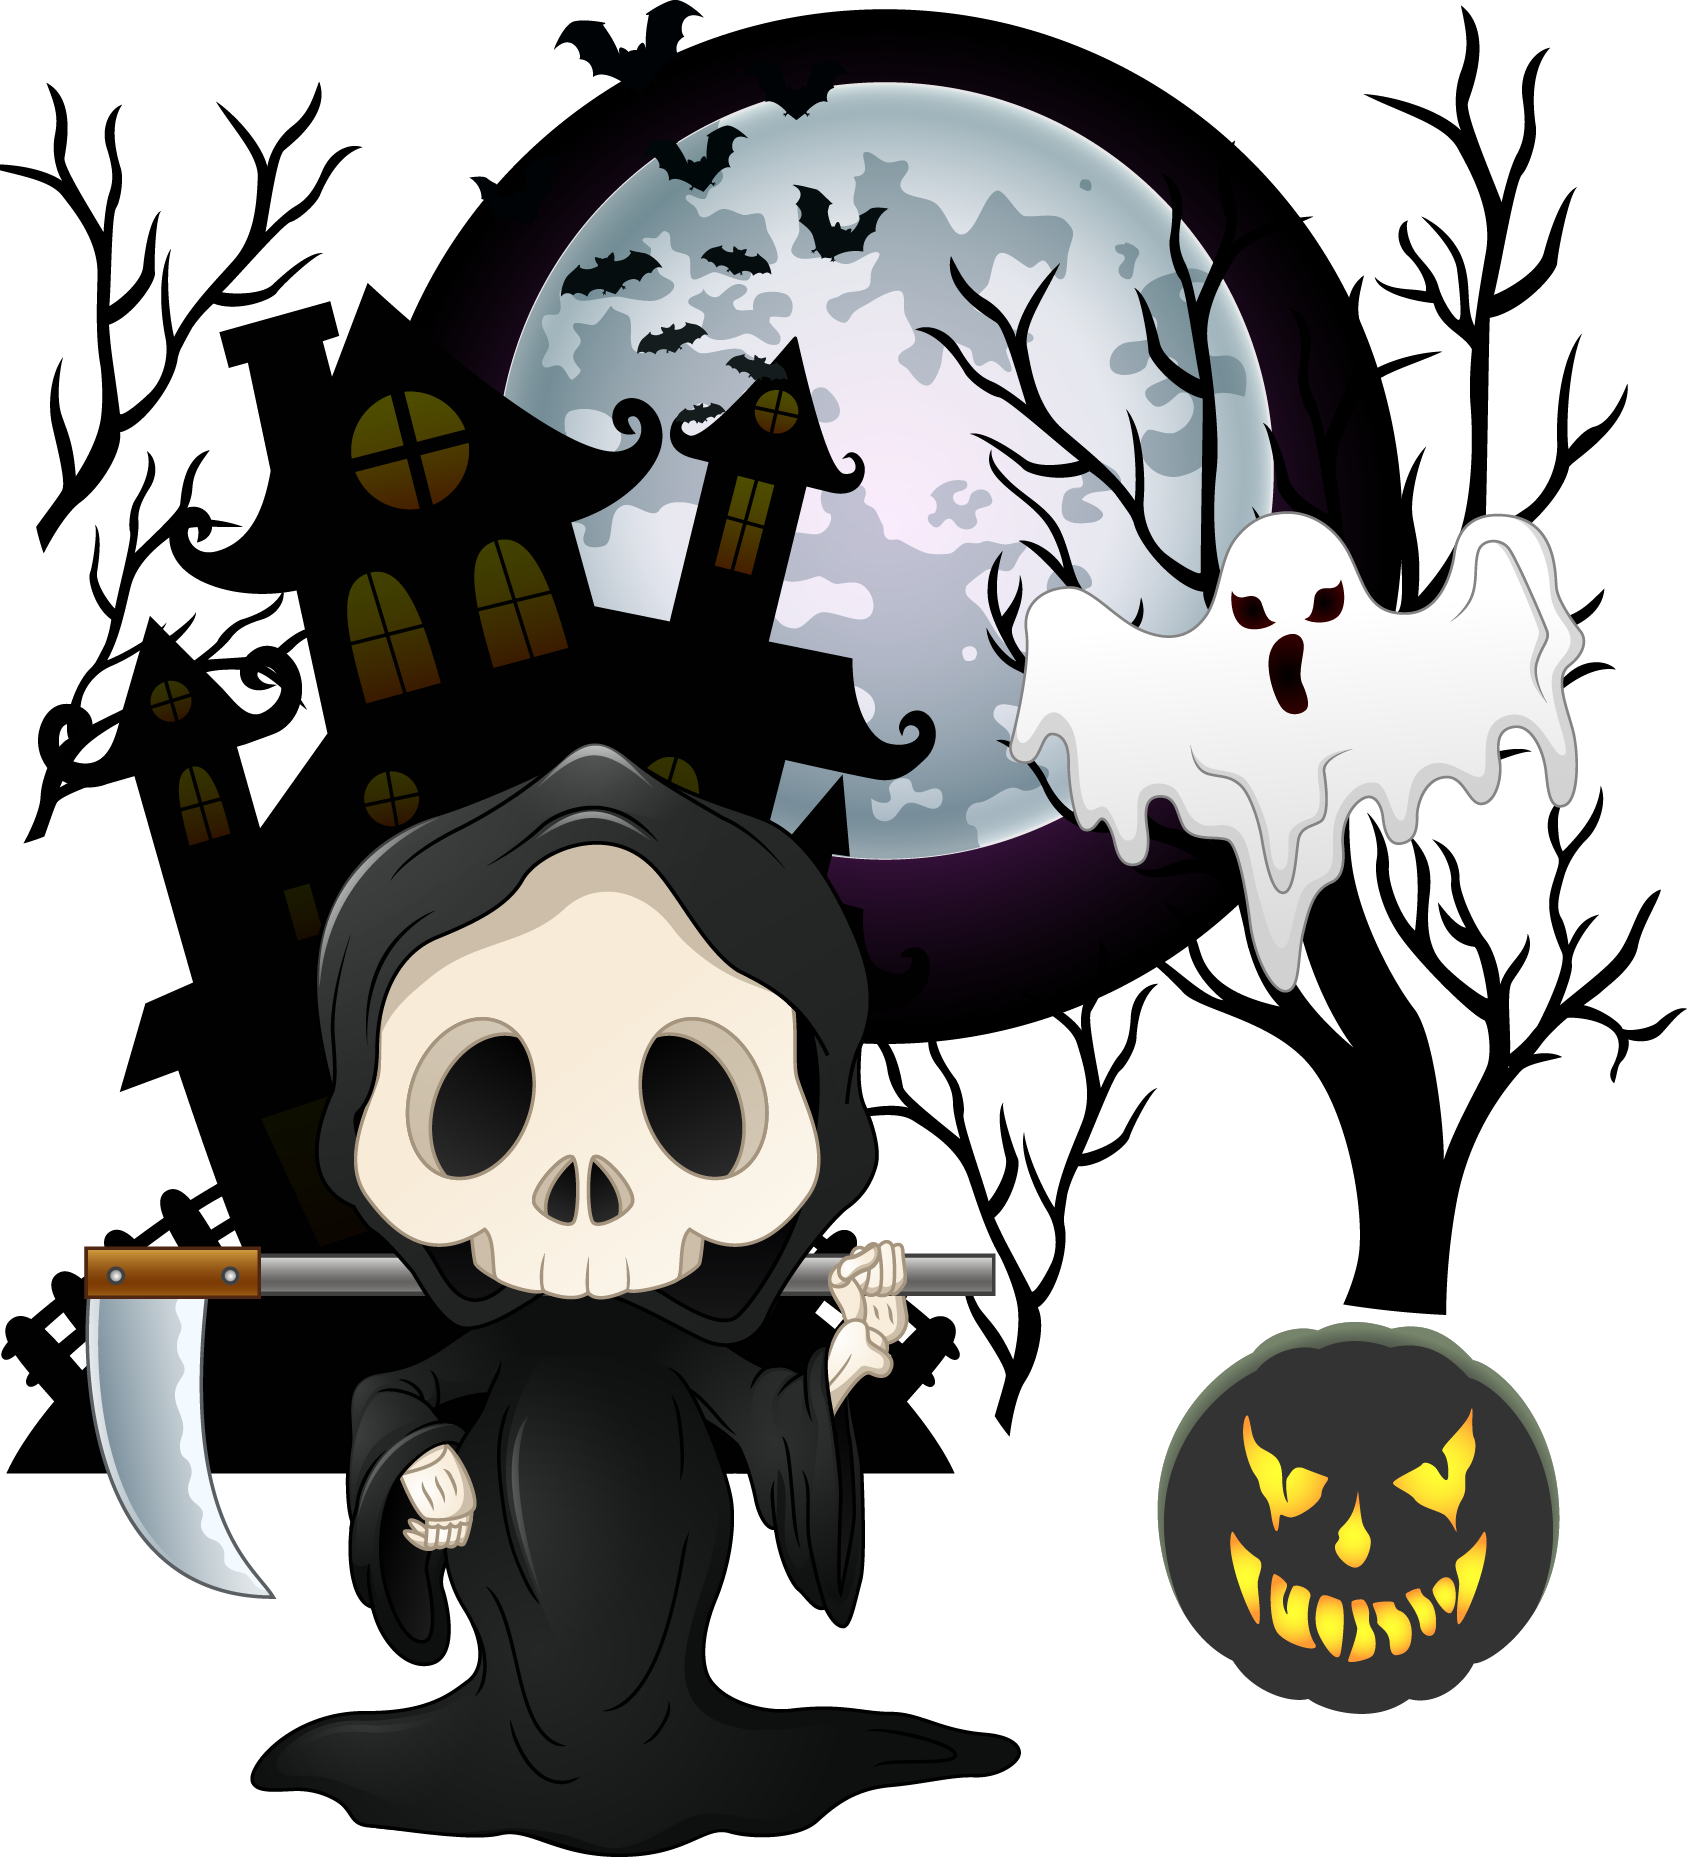 Halloween bash clipart banner Halloween Cartoon Skeleton Ghost - Halloween cartoon skull 1687*1857 ... banner